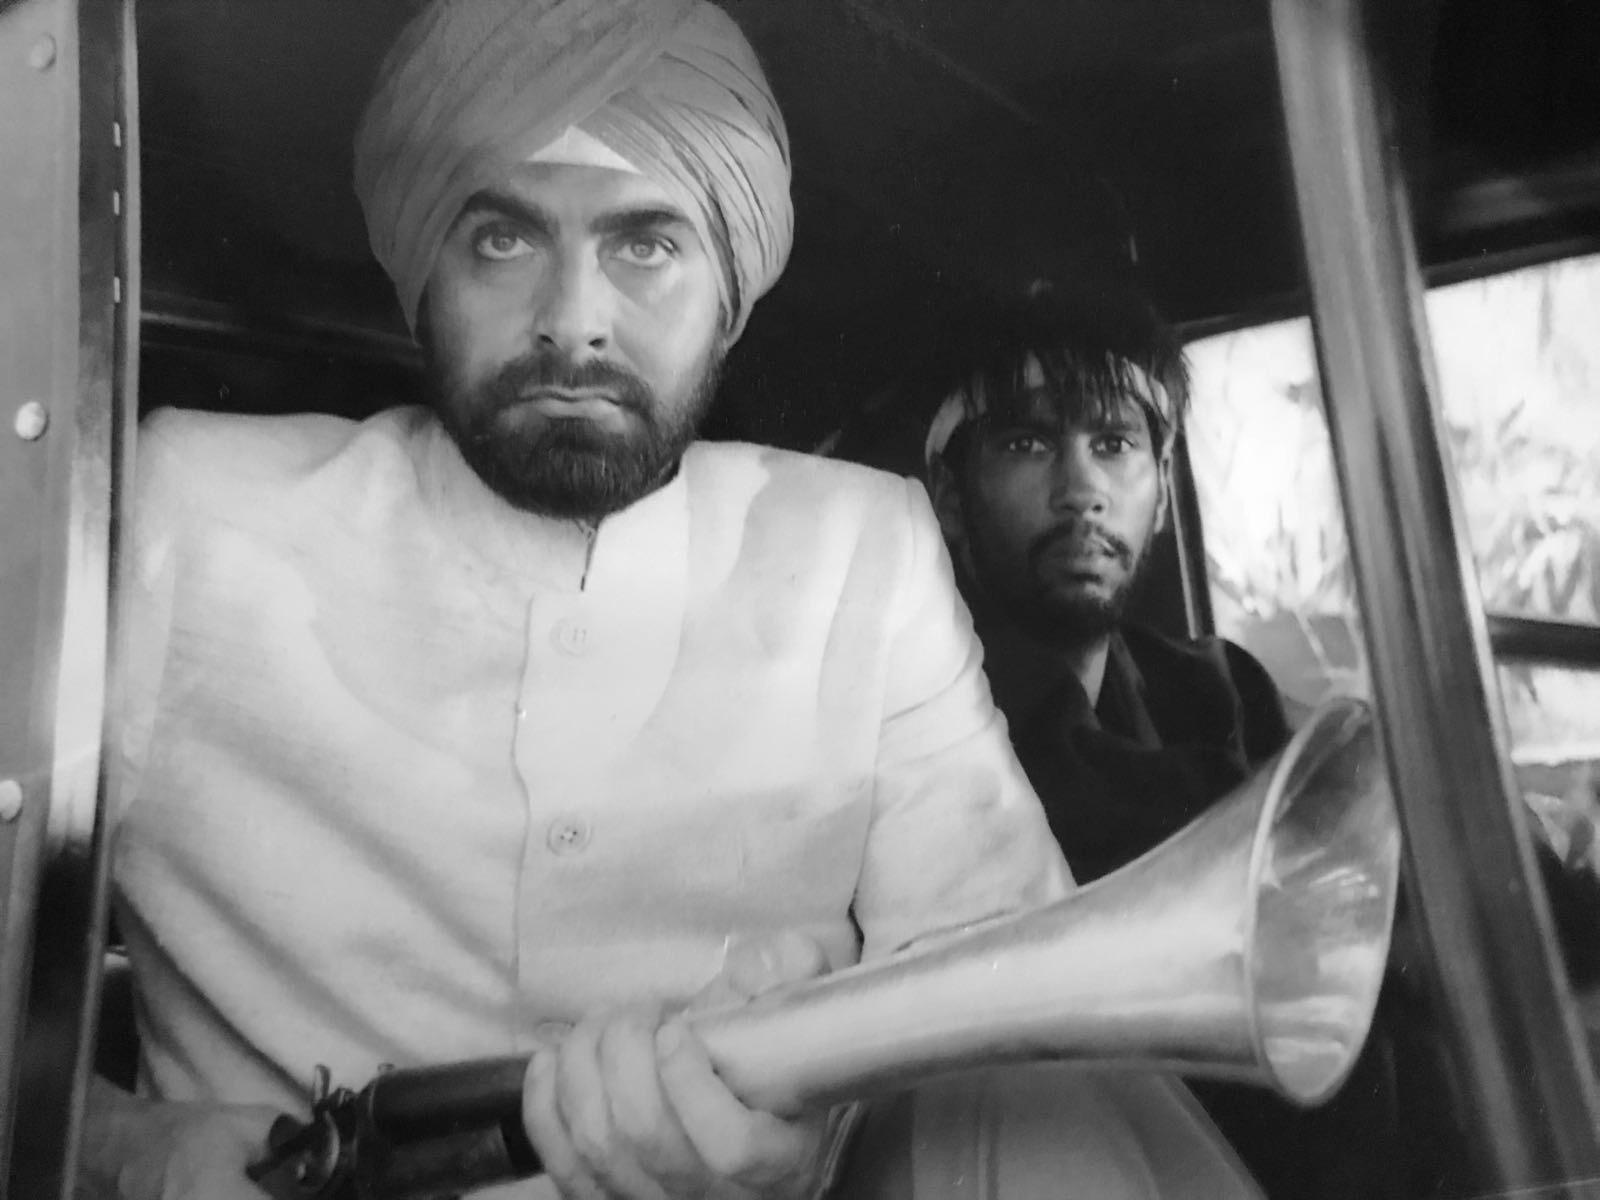 Kabir Beid and Michael Moor waiting for Roger Moore in Octopussy. Watch the scene below.